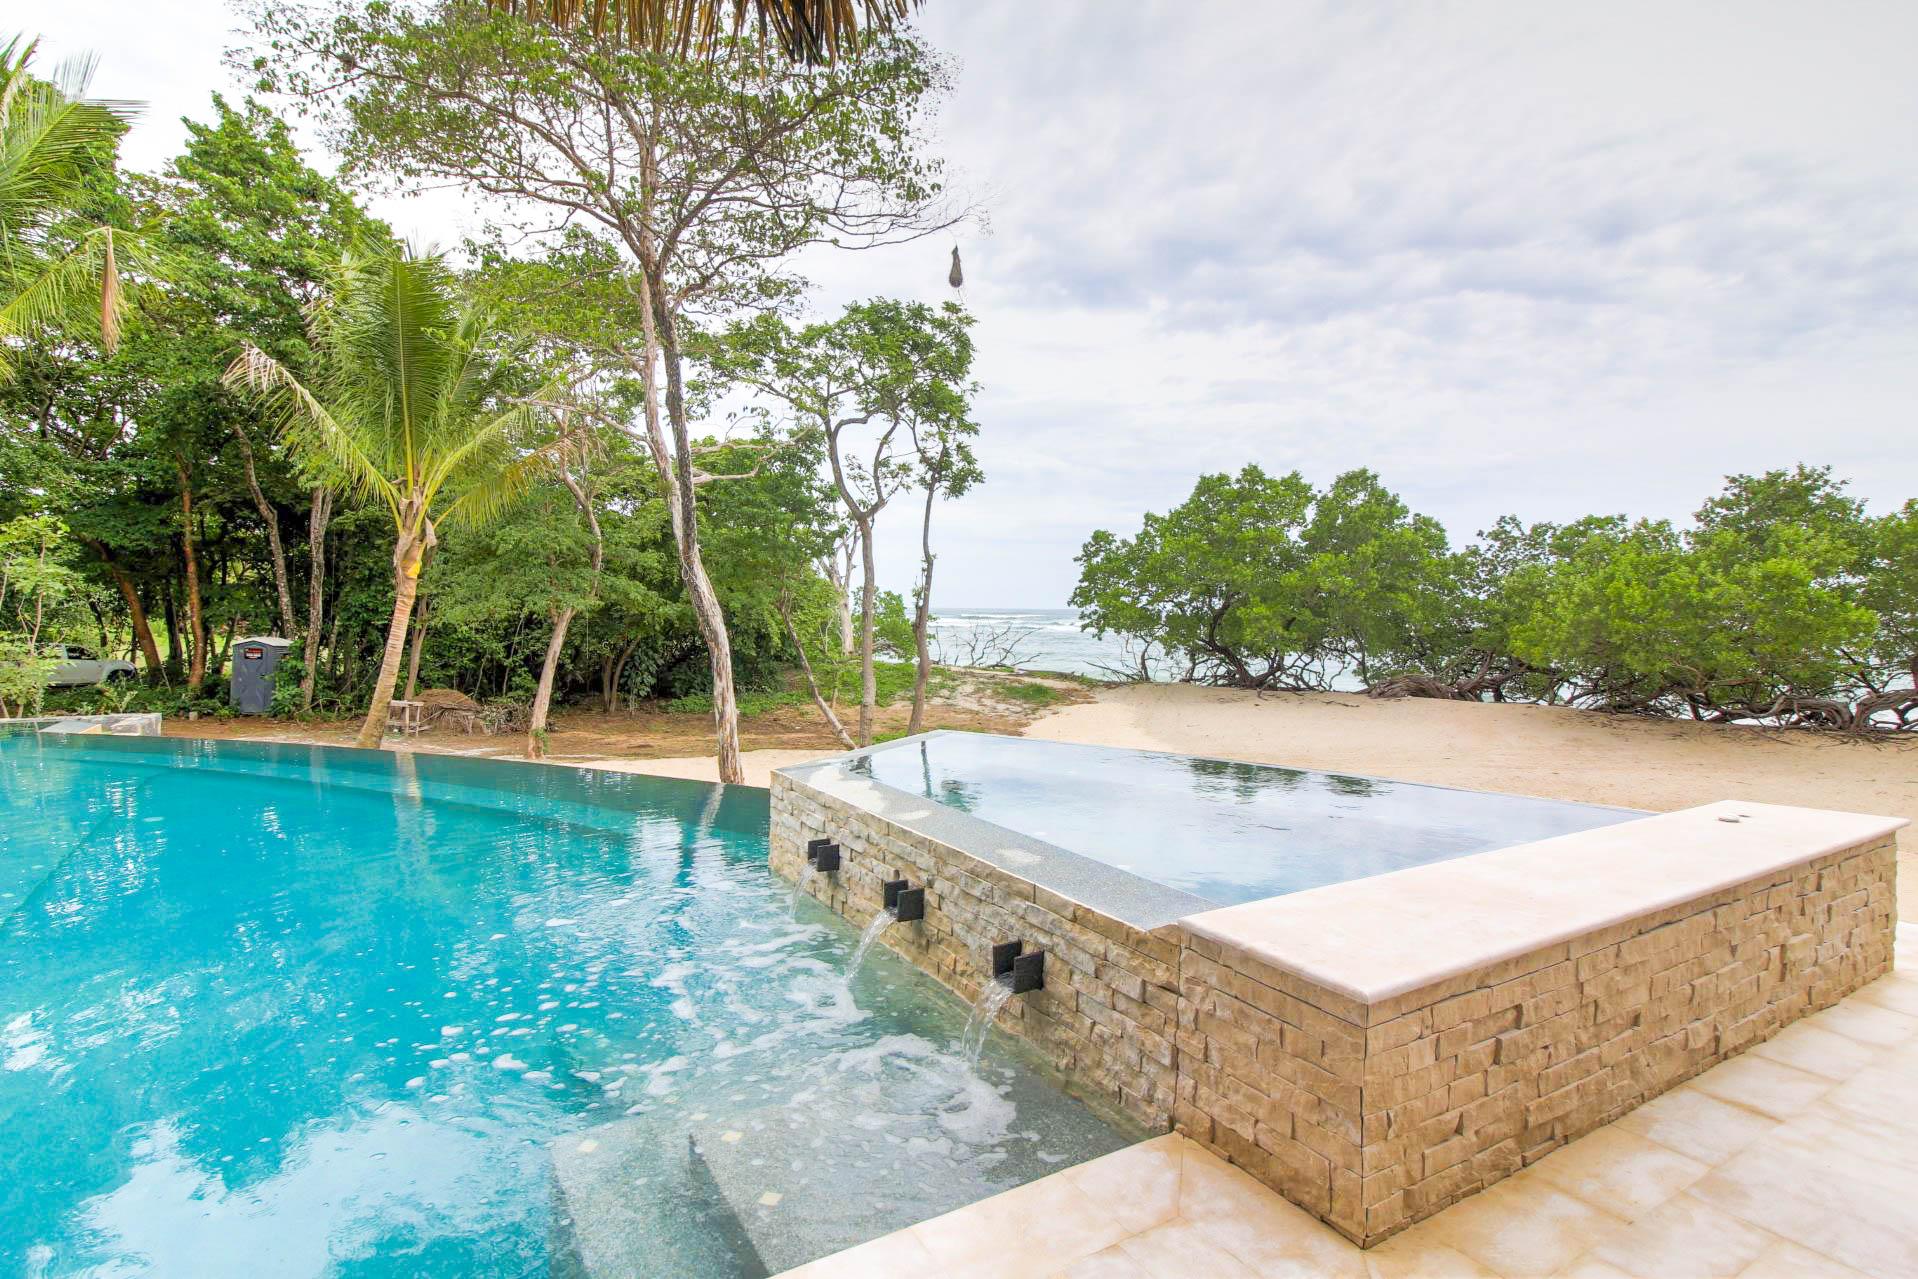 Infinity pool, hot jacuzzi, Pacific horizon